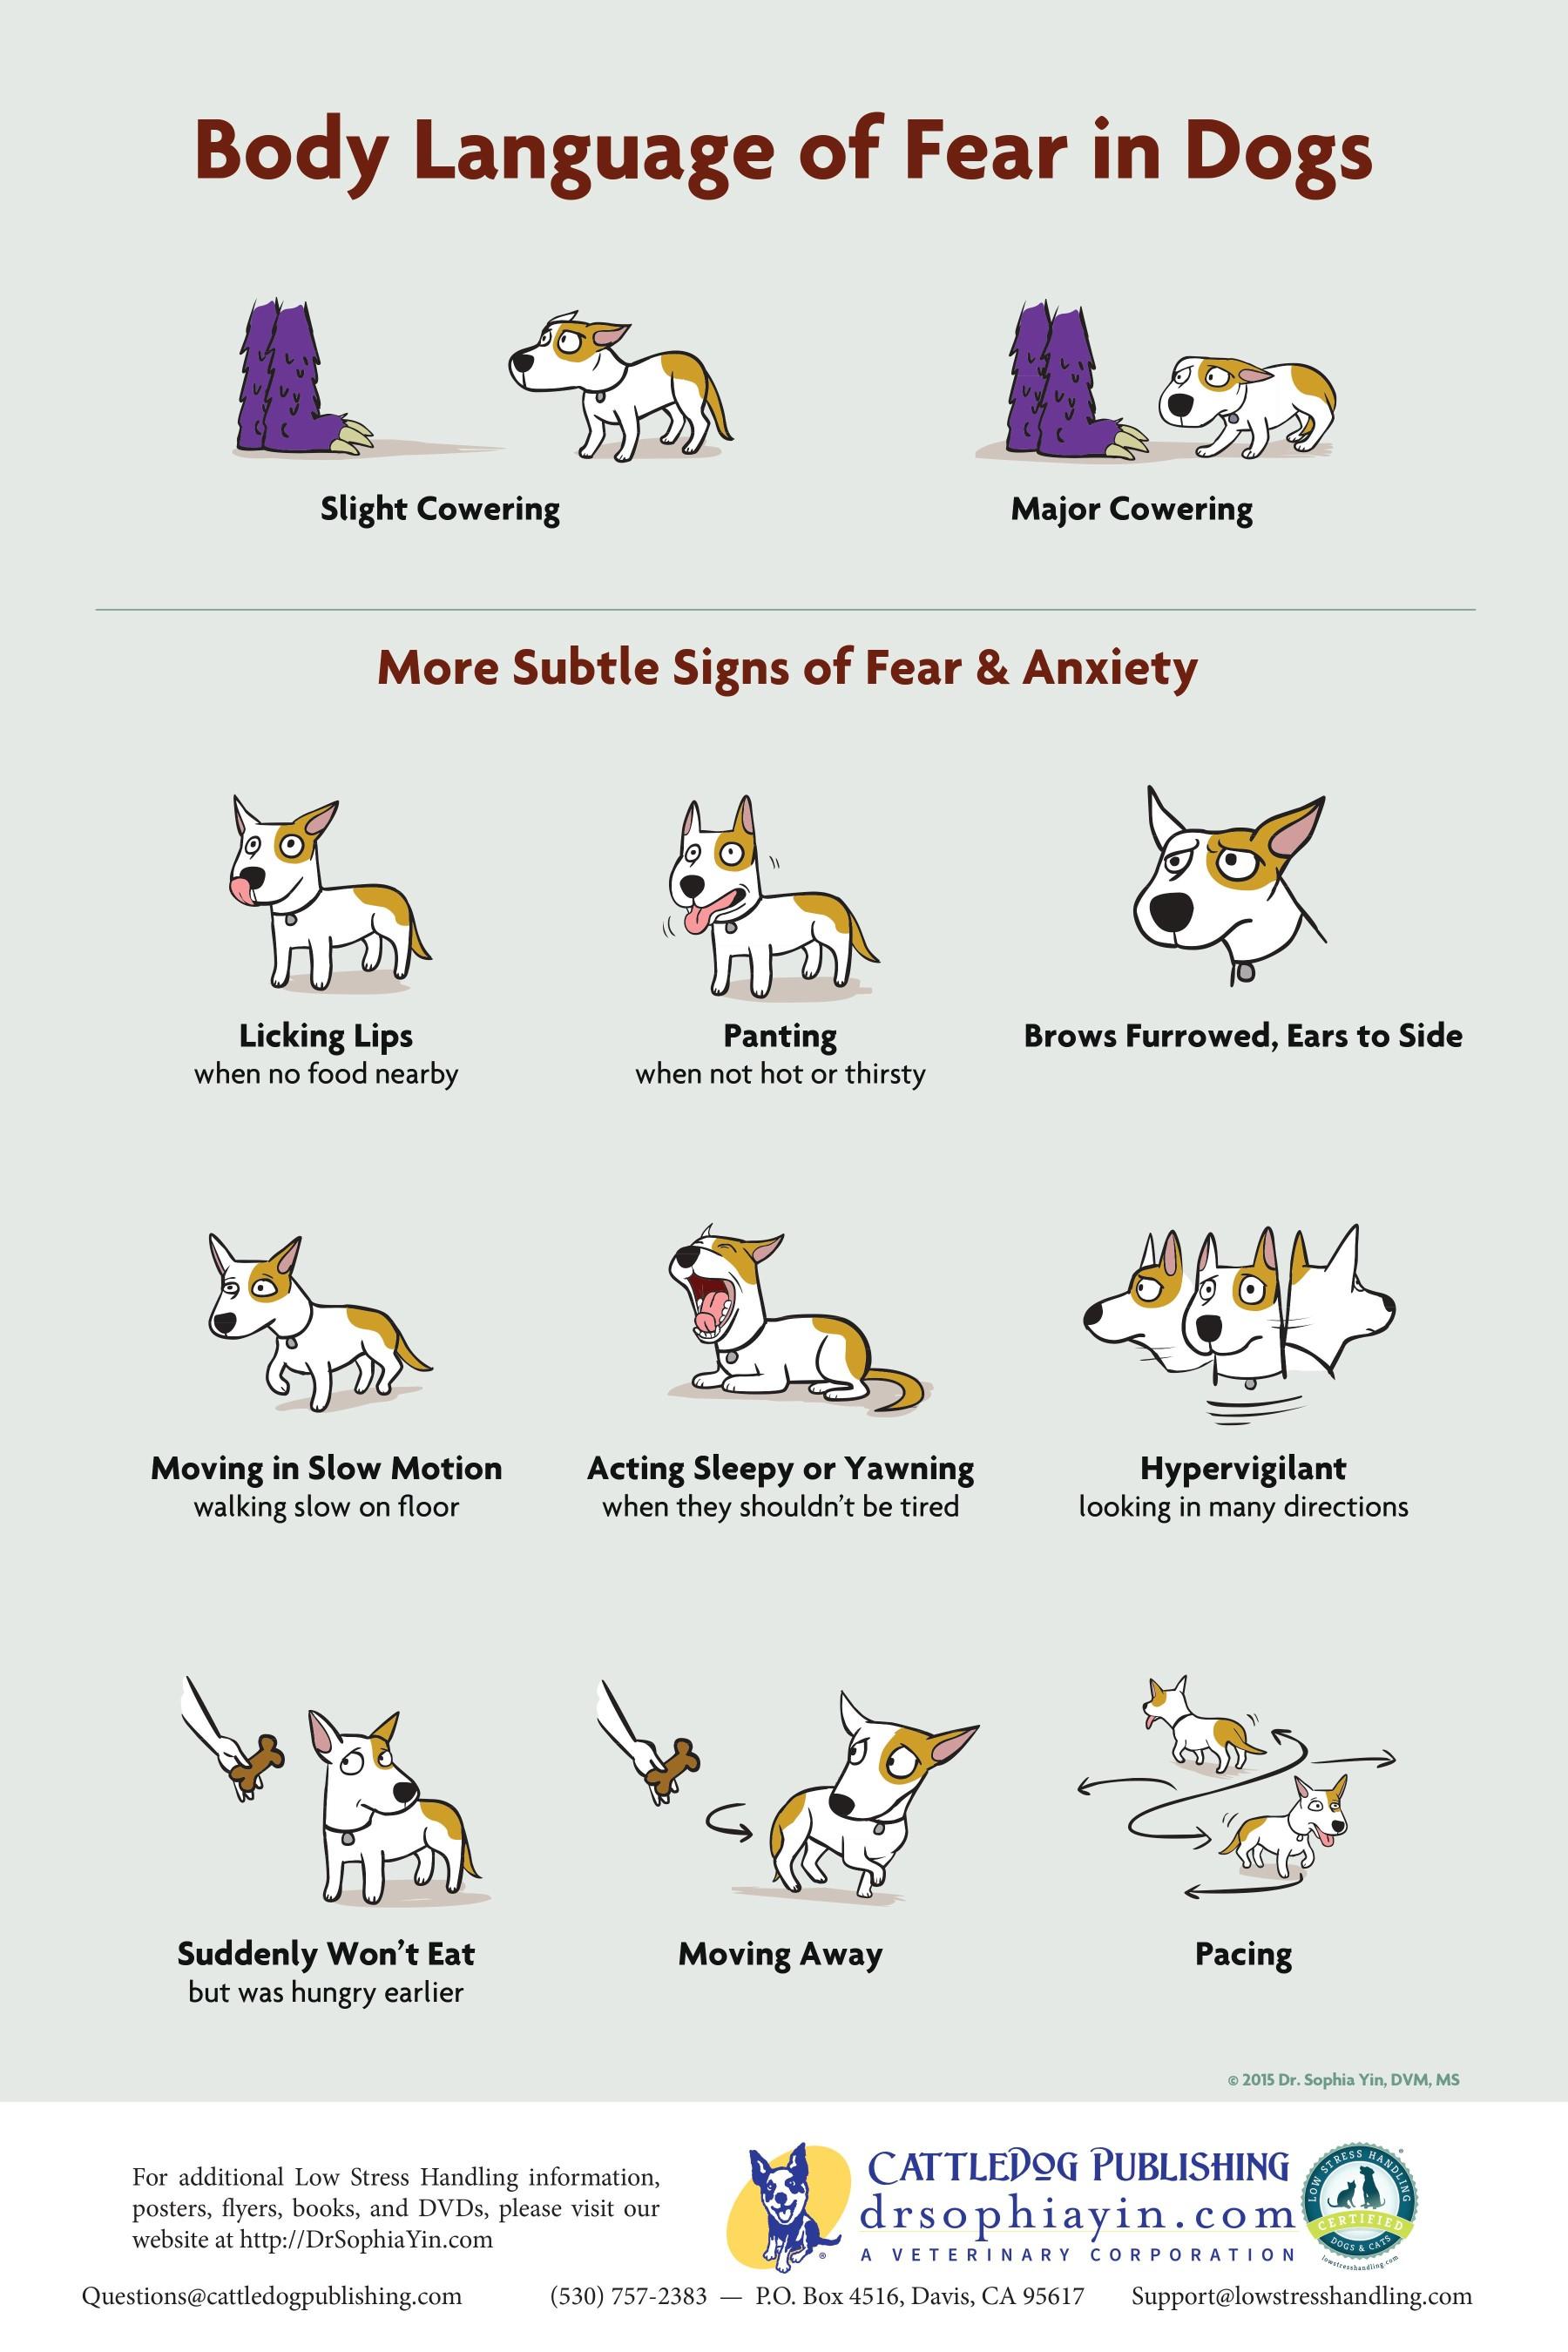 Body Language of Fear in Dogs by Dr Sophia Yin